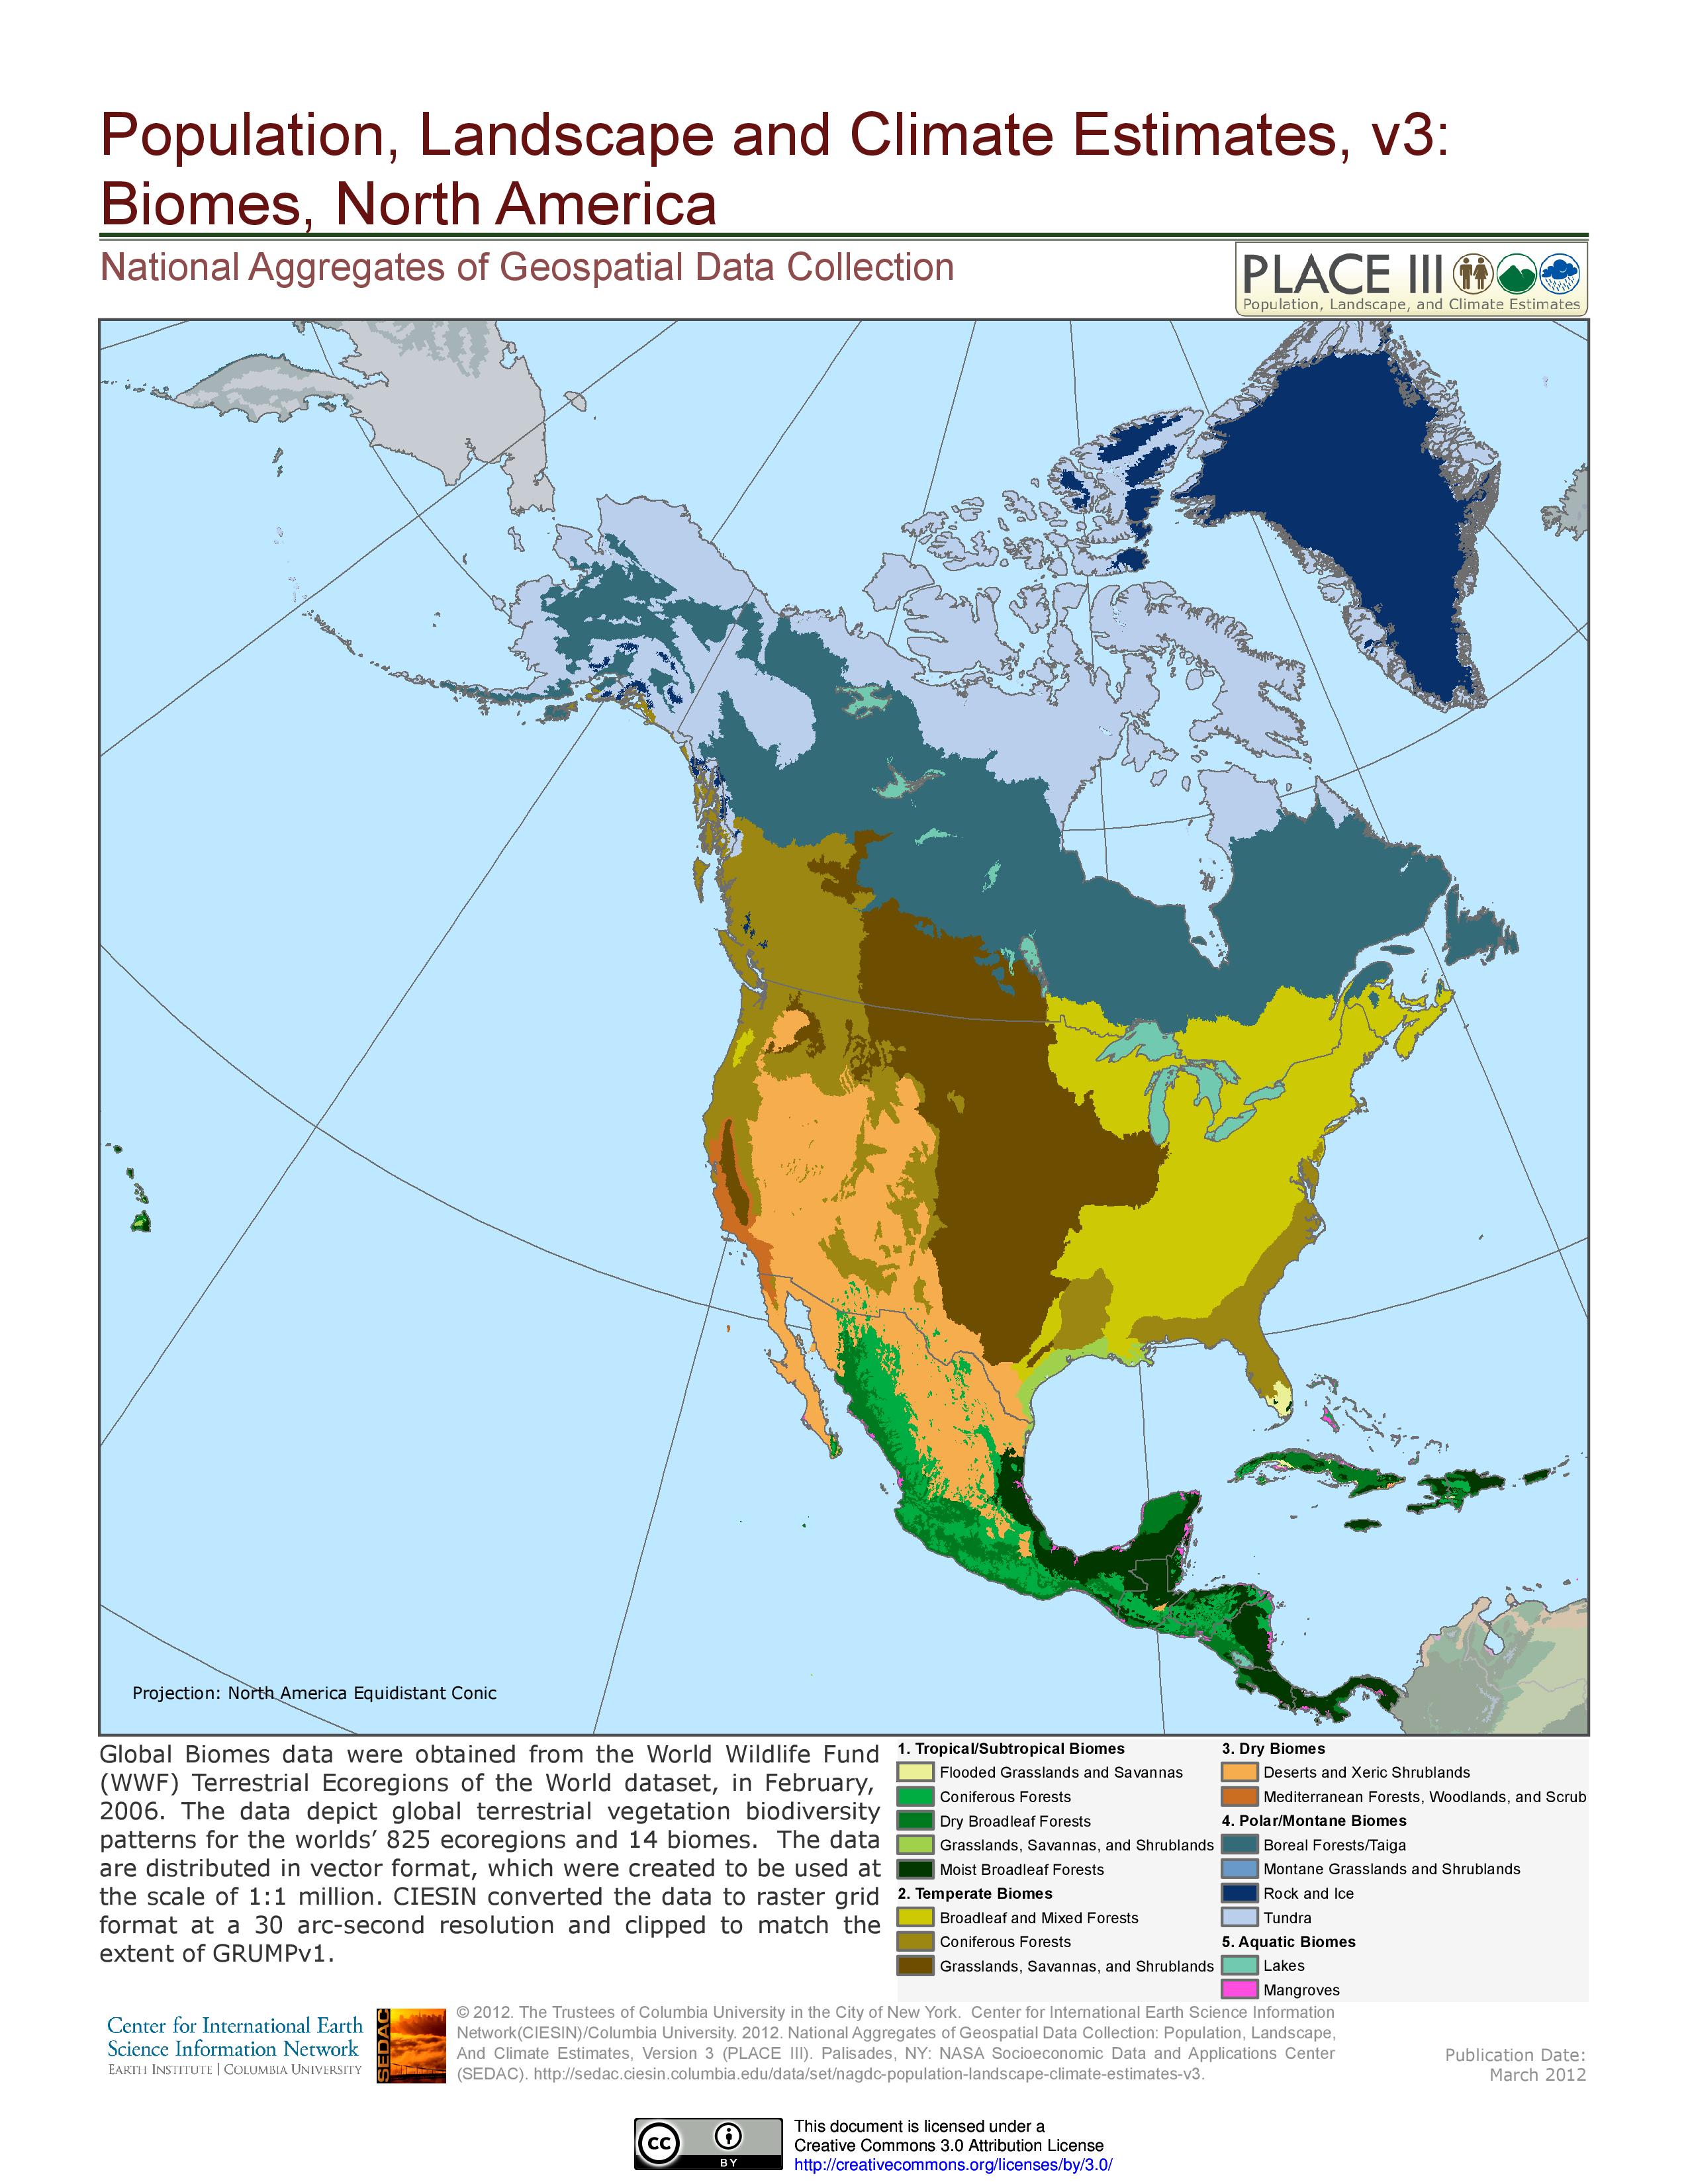 Biomes Of North America Map.Biomes Of North America Maps Biomes America Map